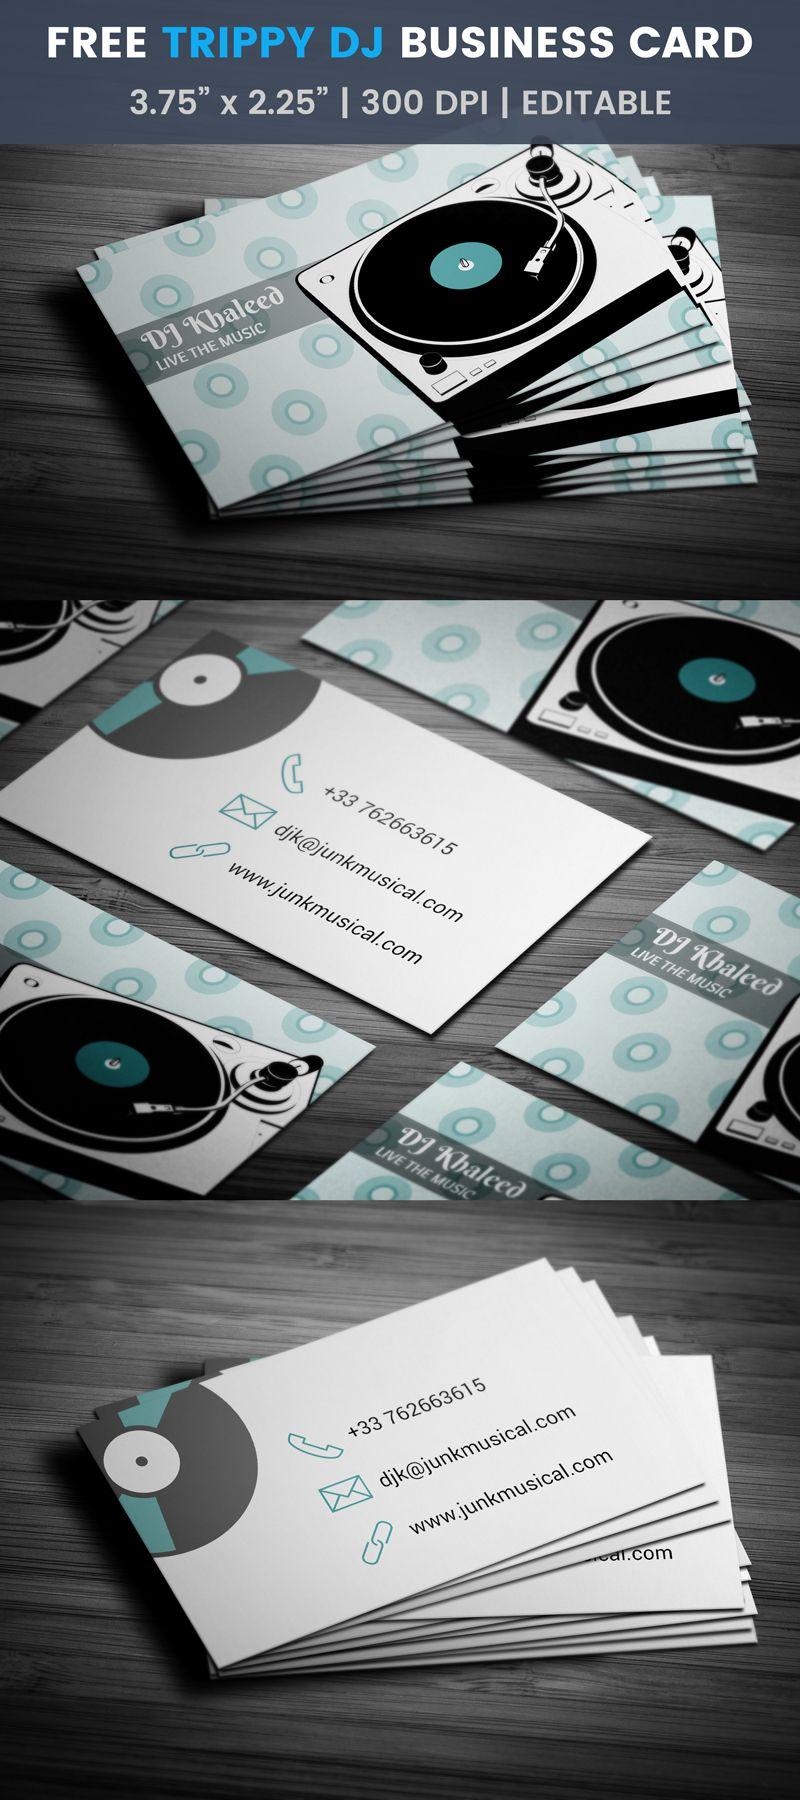 Free turntable business card pinterest dj business cards card vinyl disk dj business card template sound play dj reheart Gallery